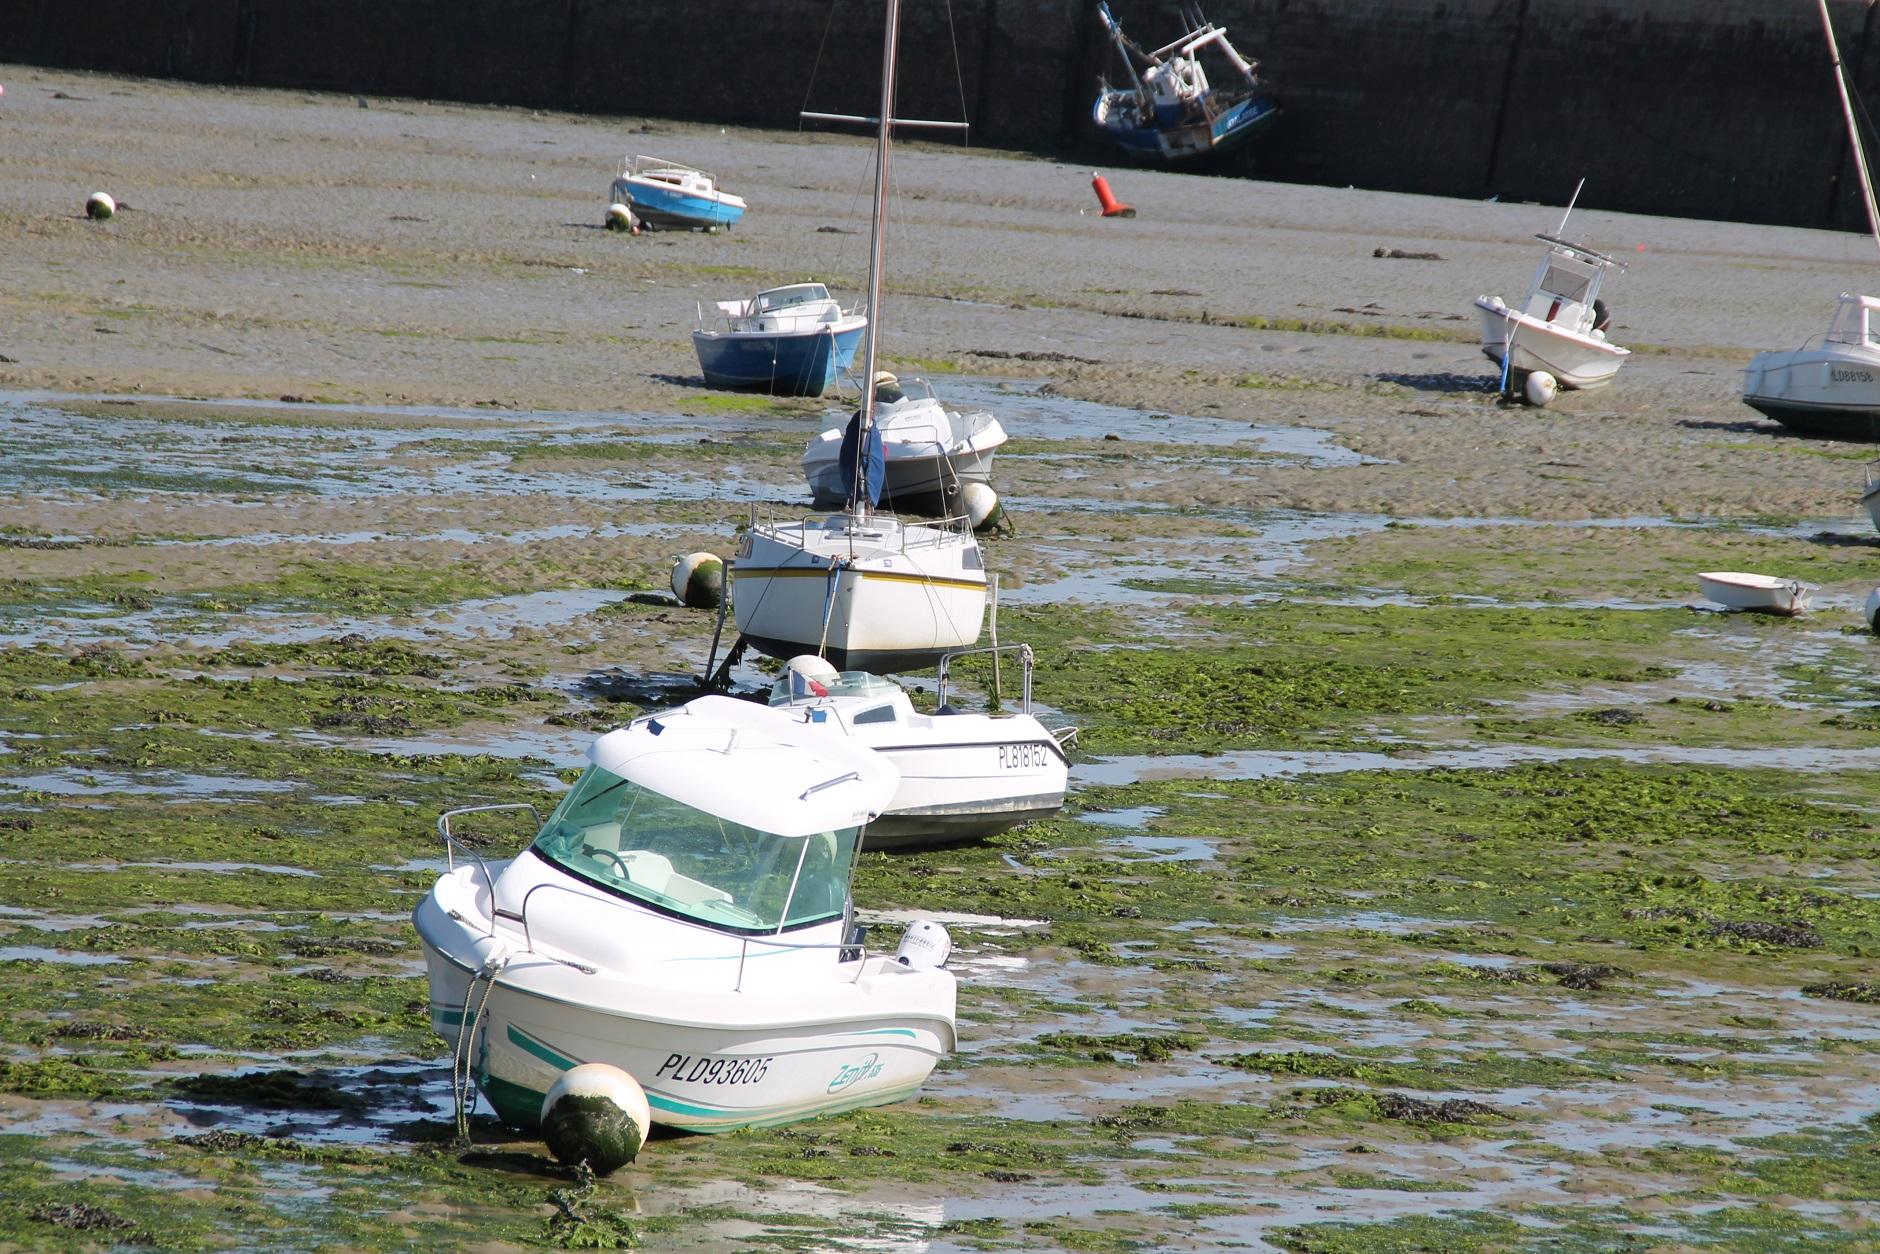 Photo perros guirec 22700 perros guirec 213091 - Office du tourisme perros guirec bretagne ...